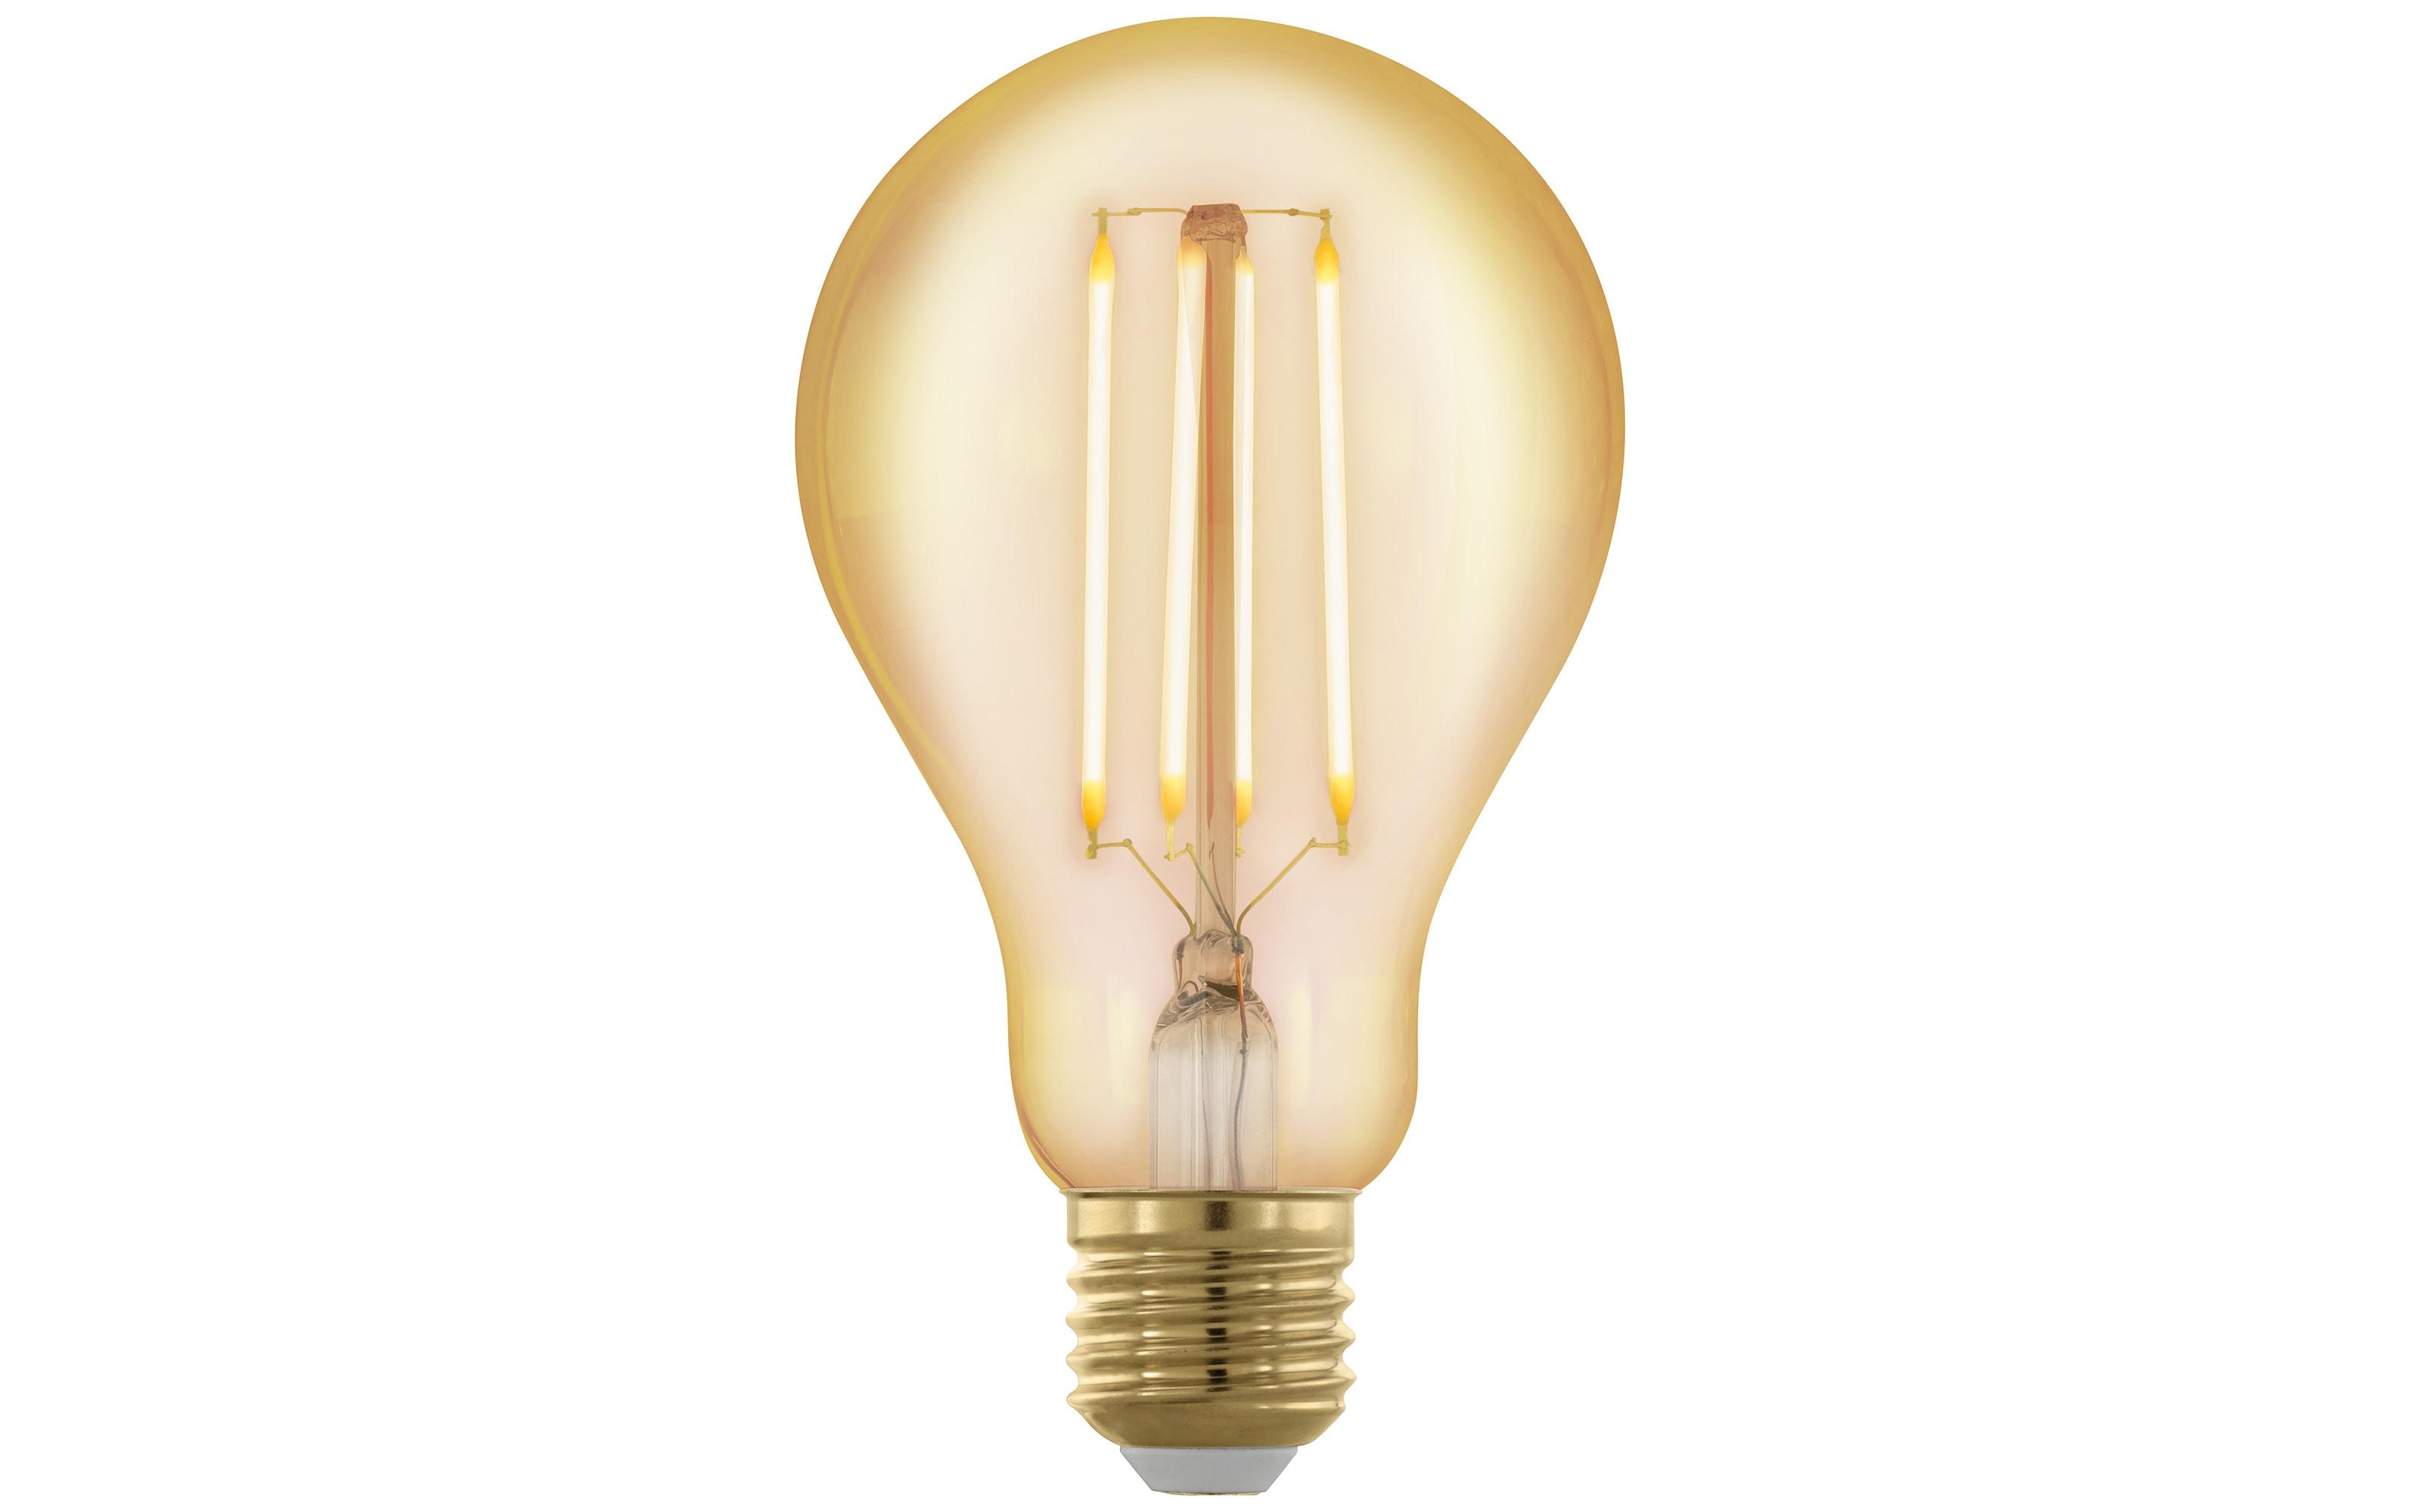 LED-Filament Golden Age AGL 4W / E27, 13,3 cm